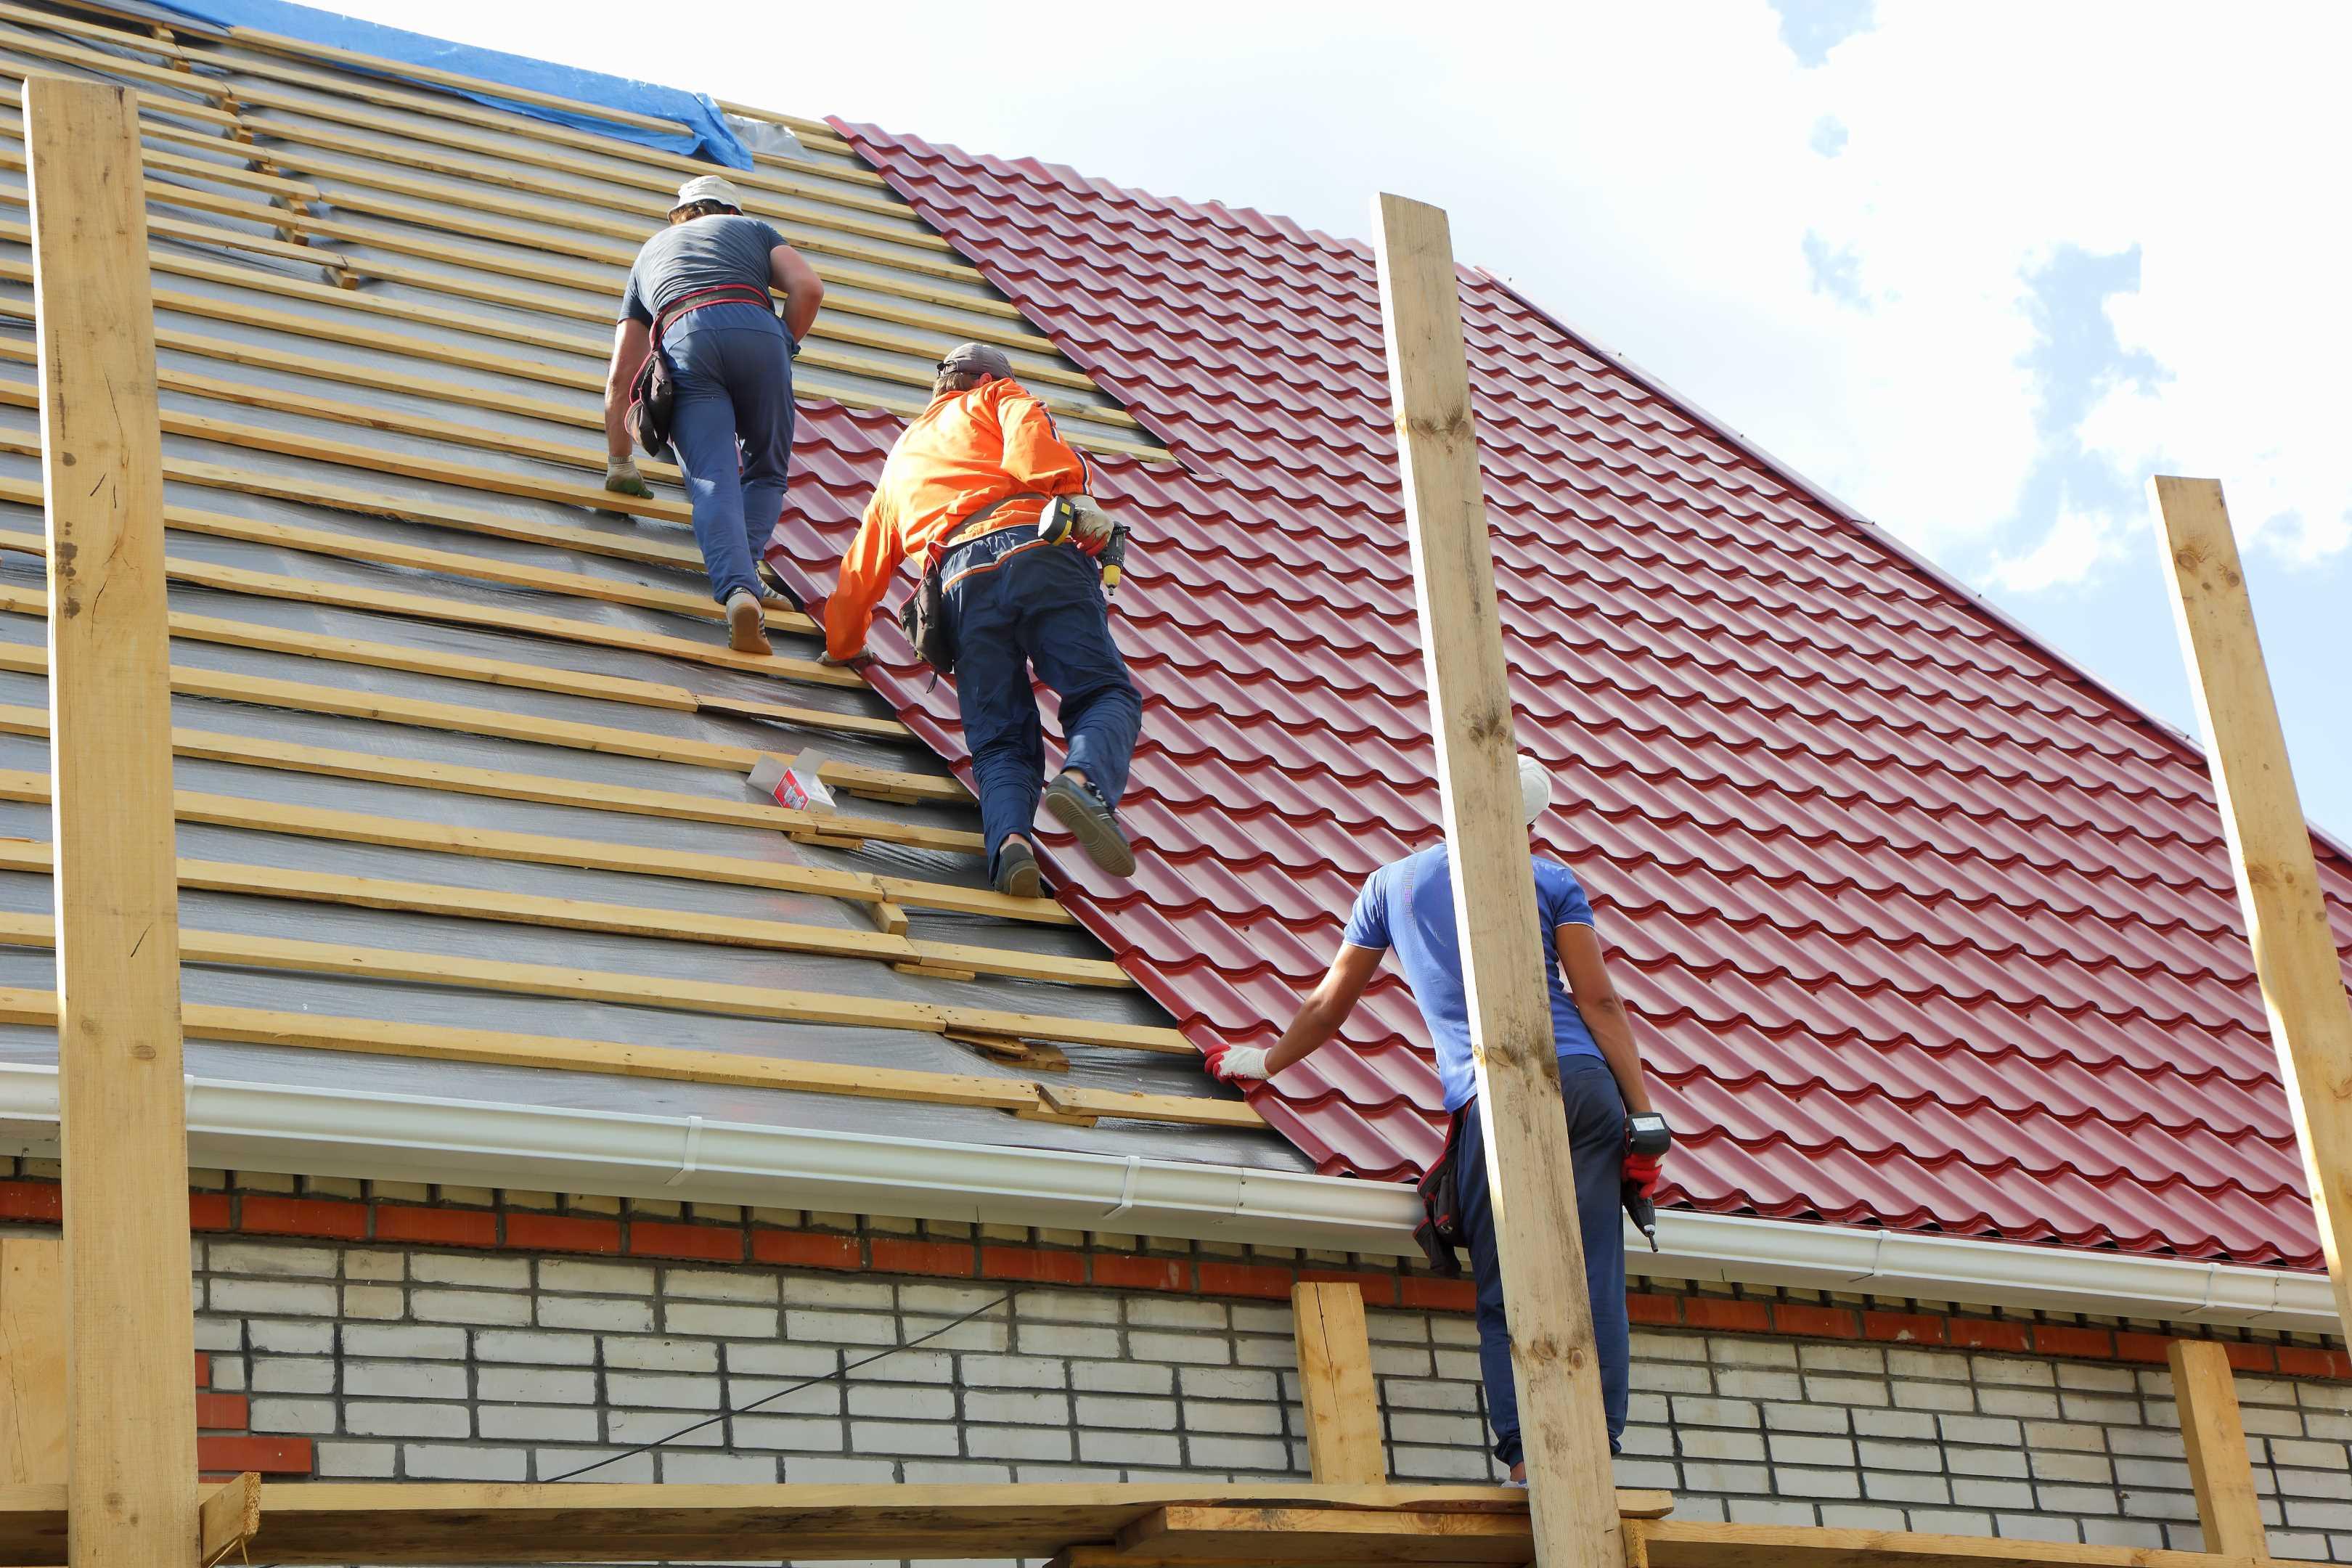 Roofer | Span Roofing